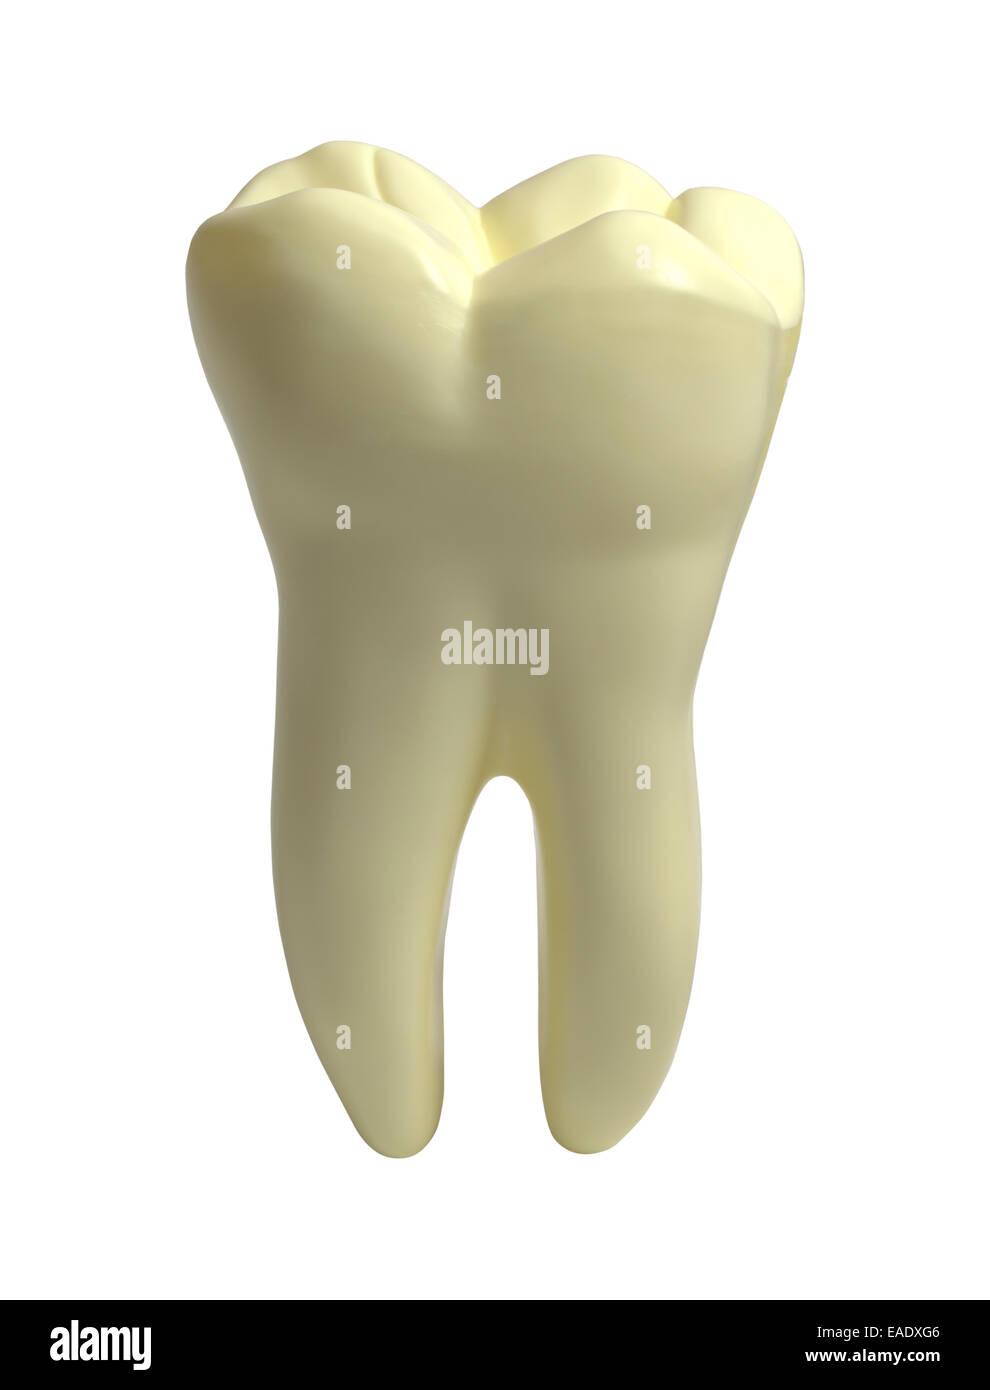 Large Single Molar Human Tooth Isolated on White Background. - Stock Image